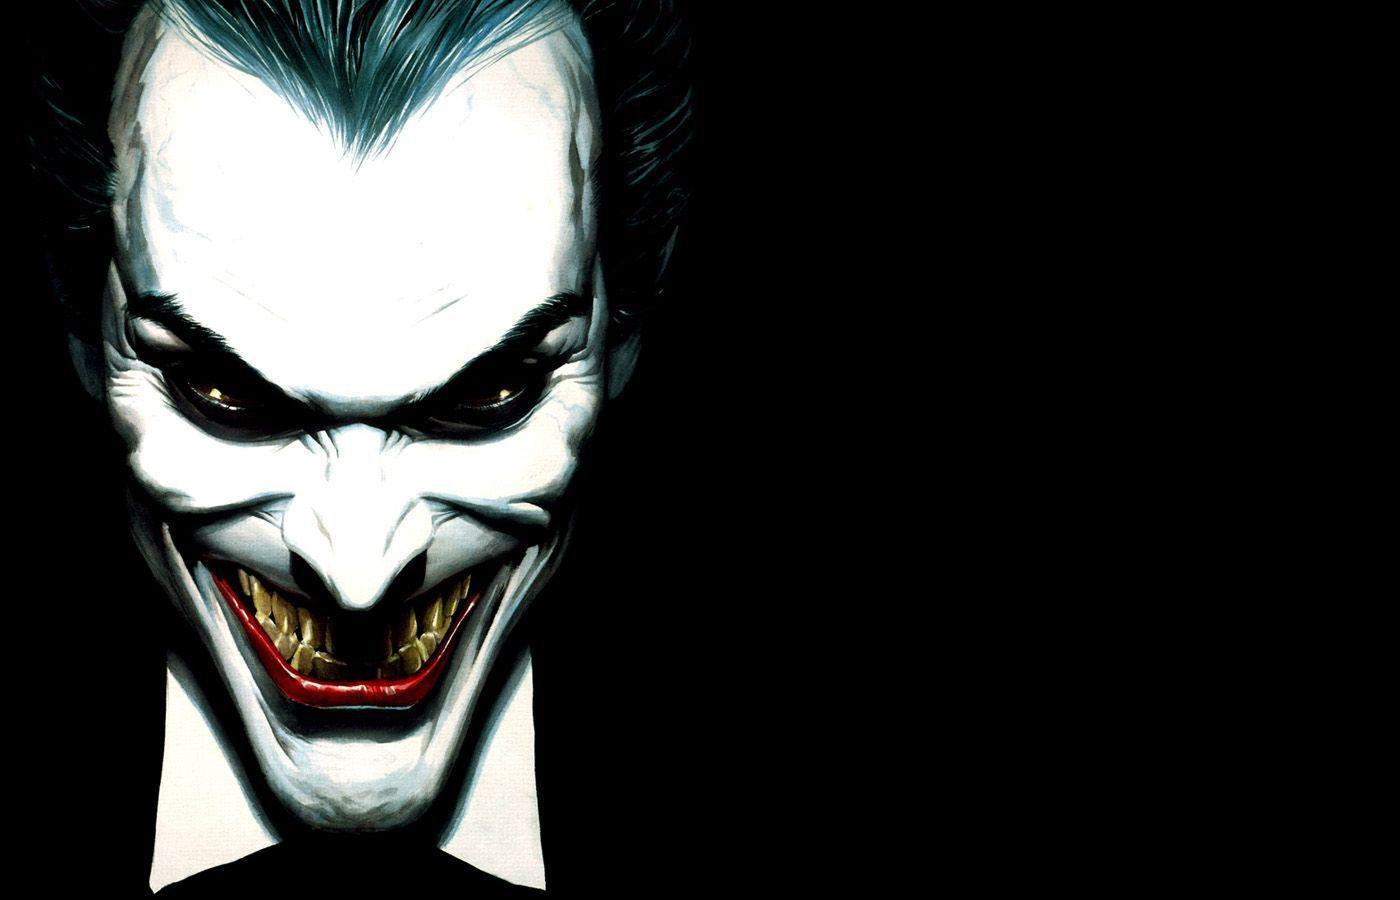 Wallpaper download joker - Joker Wallpaper Joker Wallpaper Part 4